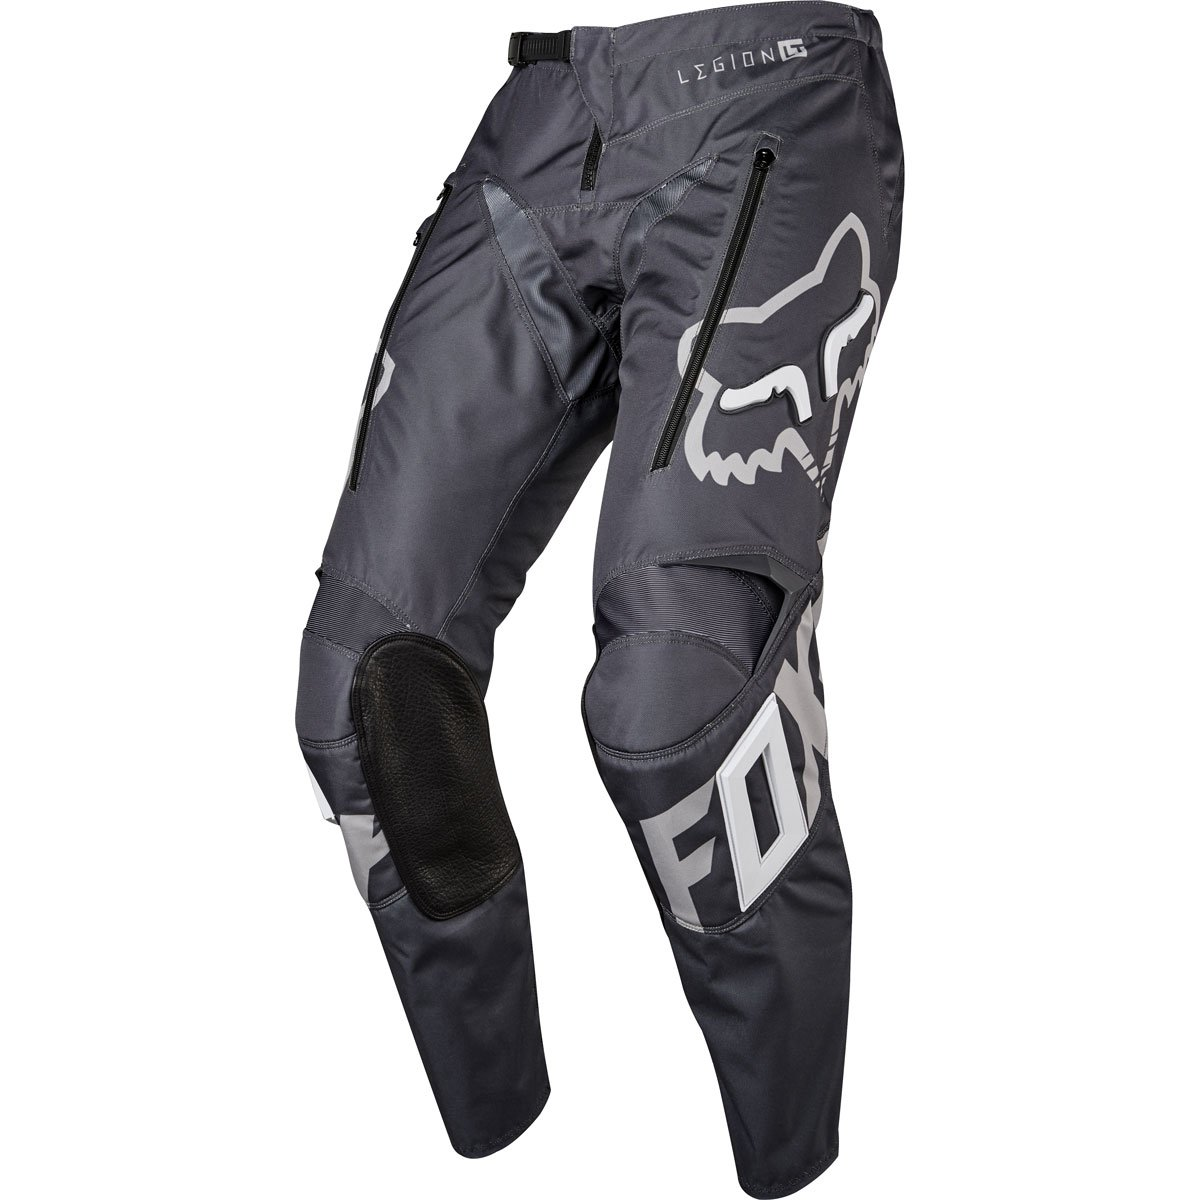 2018 Fox Racing Legion LT Offroad Pants-Charcoal-28